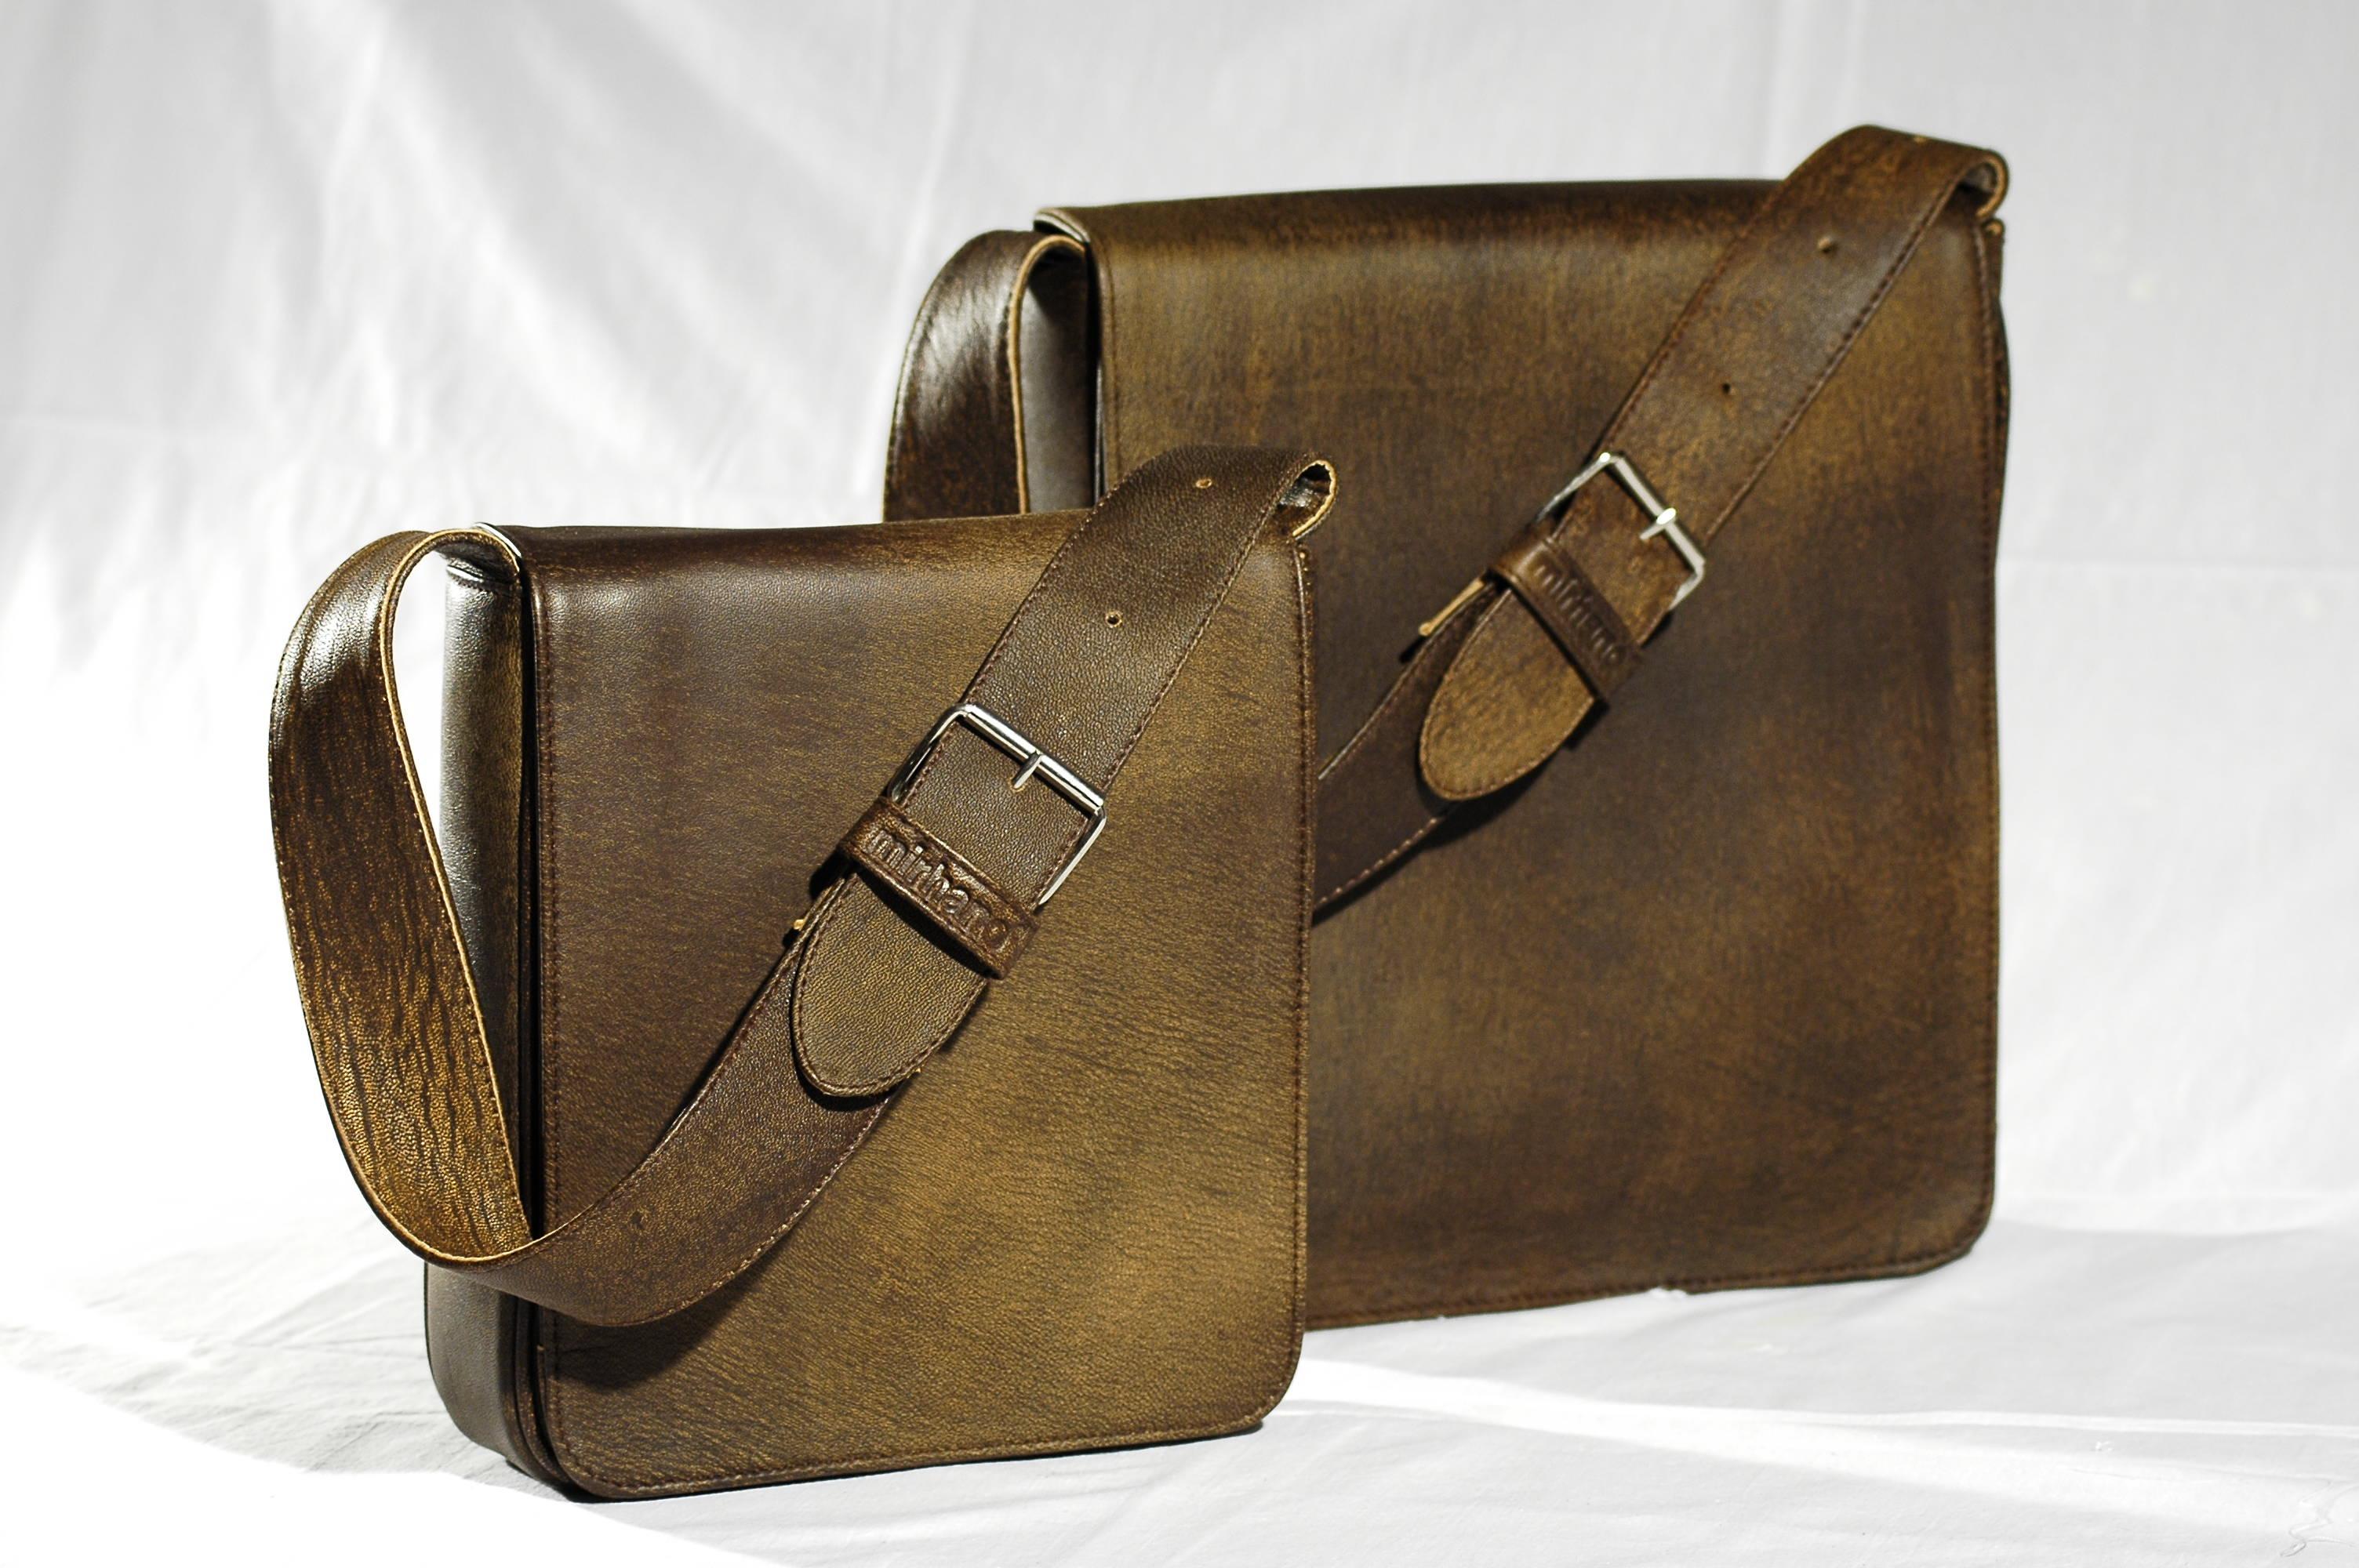 sac luxe cuir marron